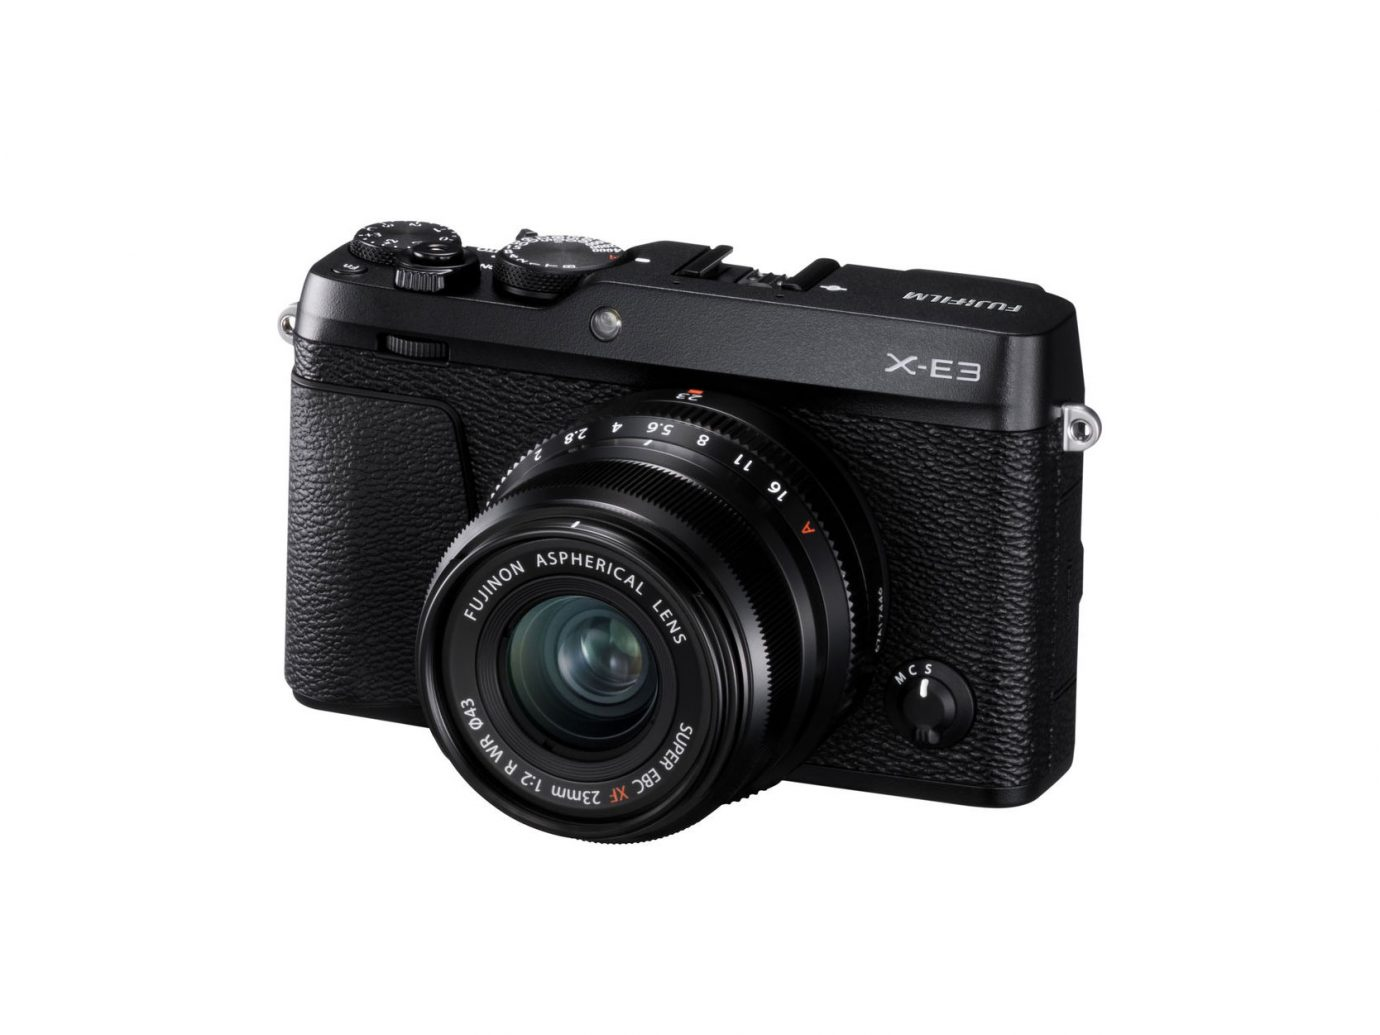 Fuji X-E3 Digital Camera